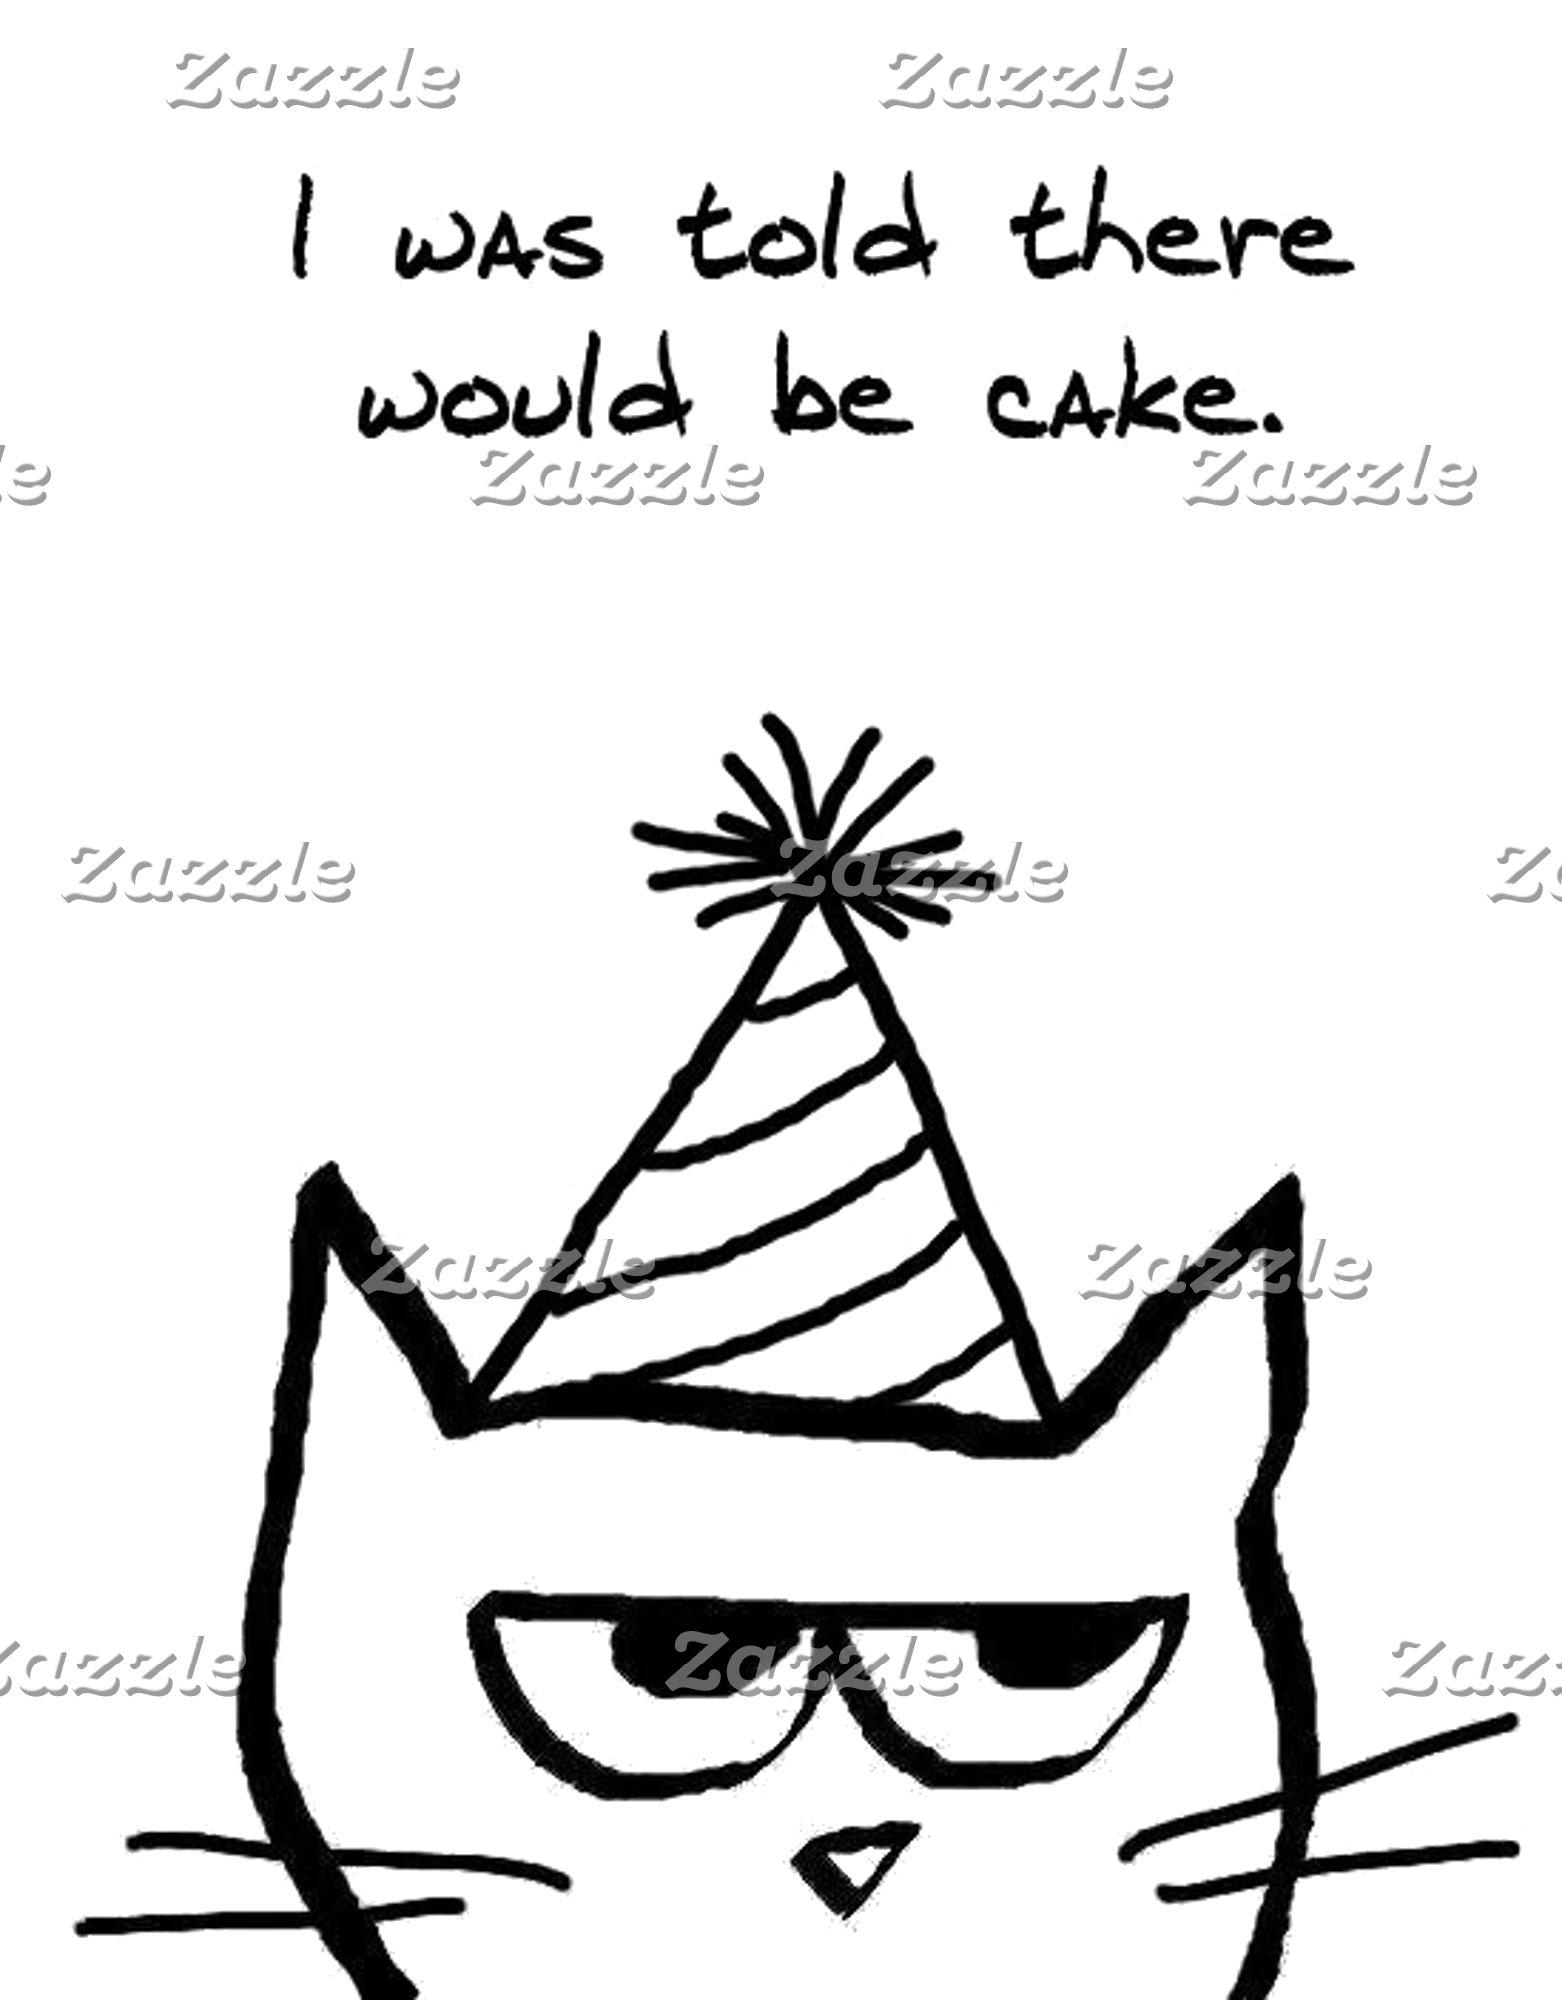 Birthdays, Weddings, Baby, Grads